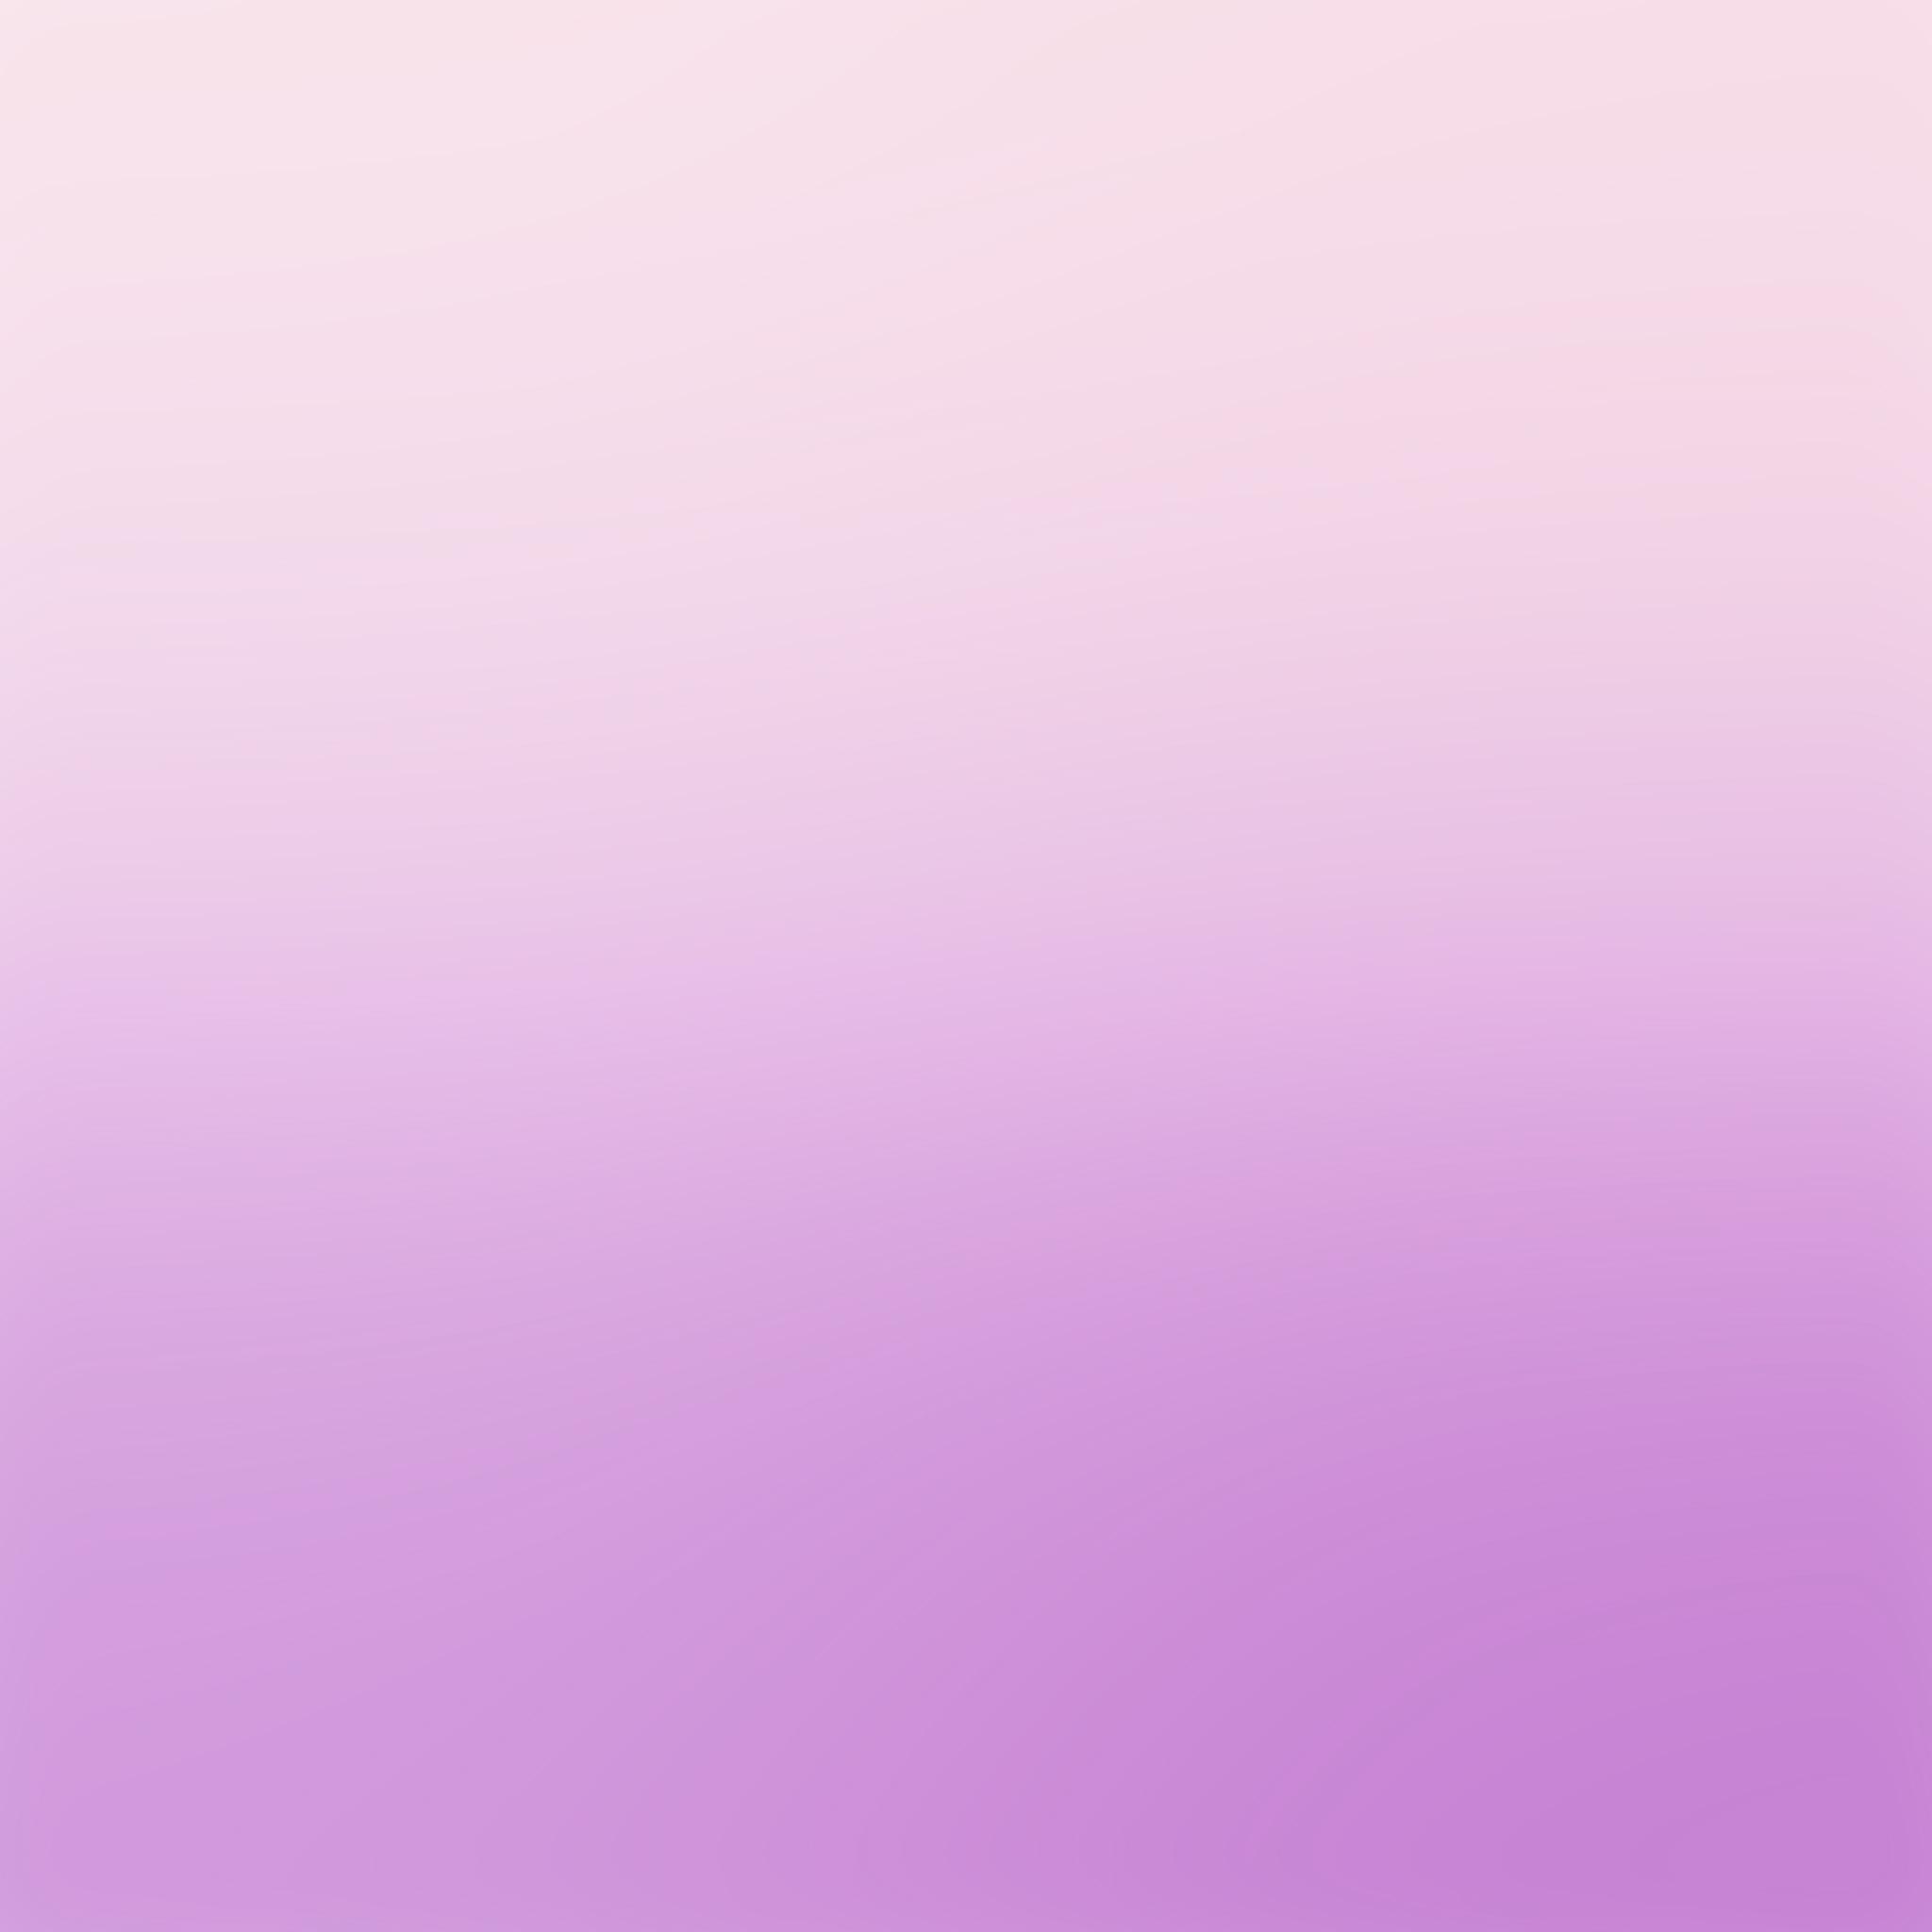 Sl95 Soft Pastel Violet Blur Gradation Wallpaper